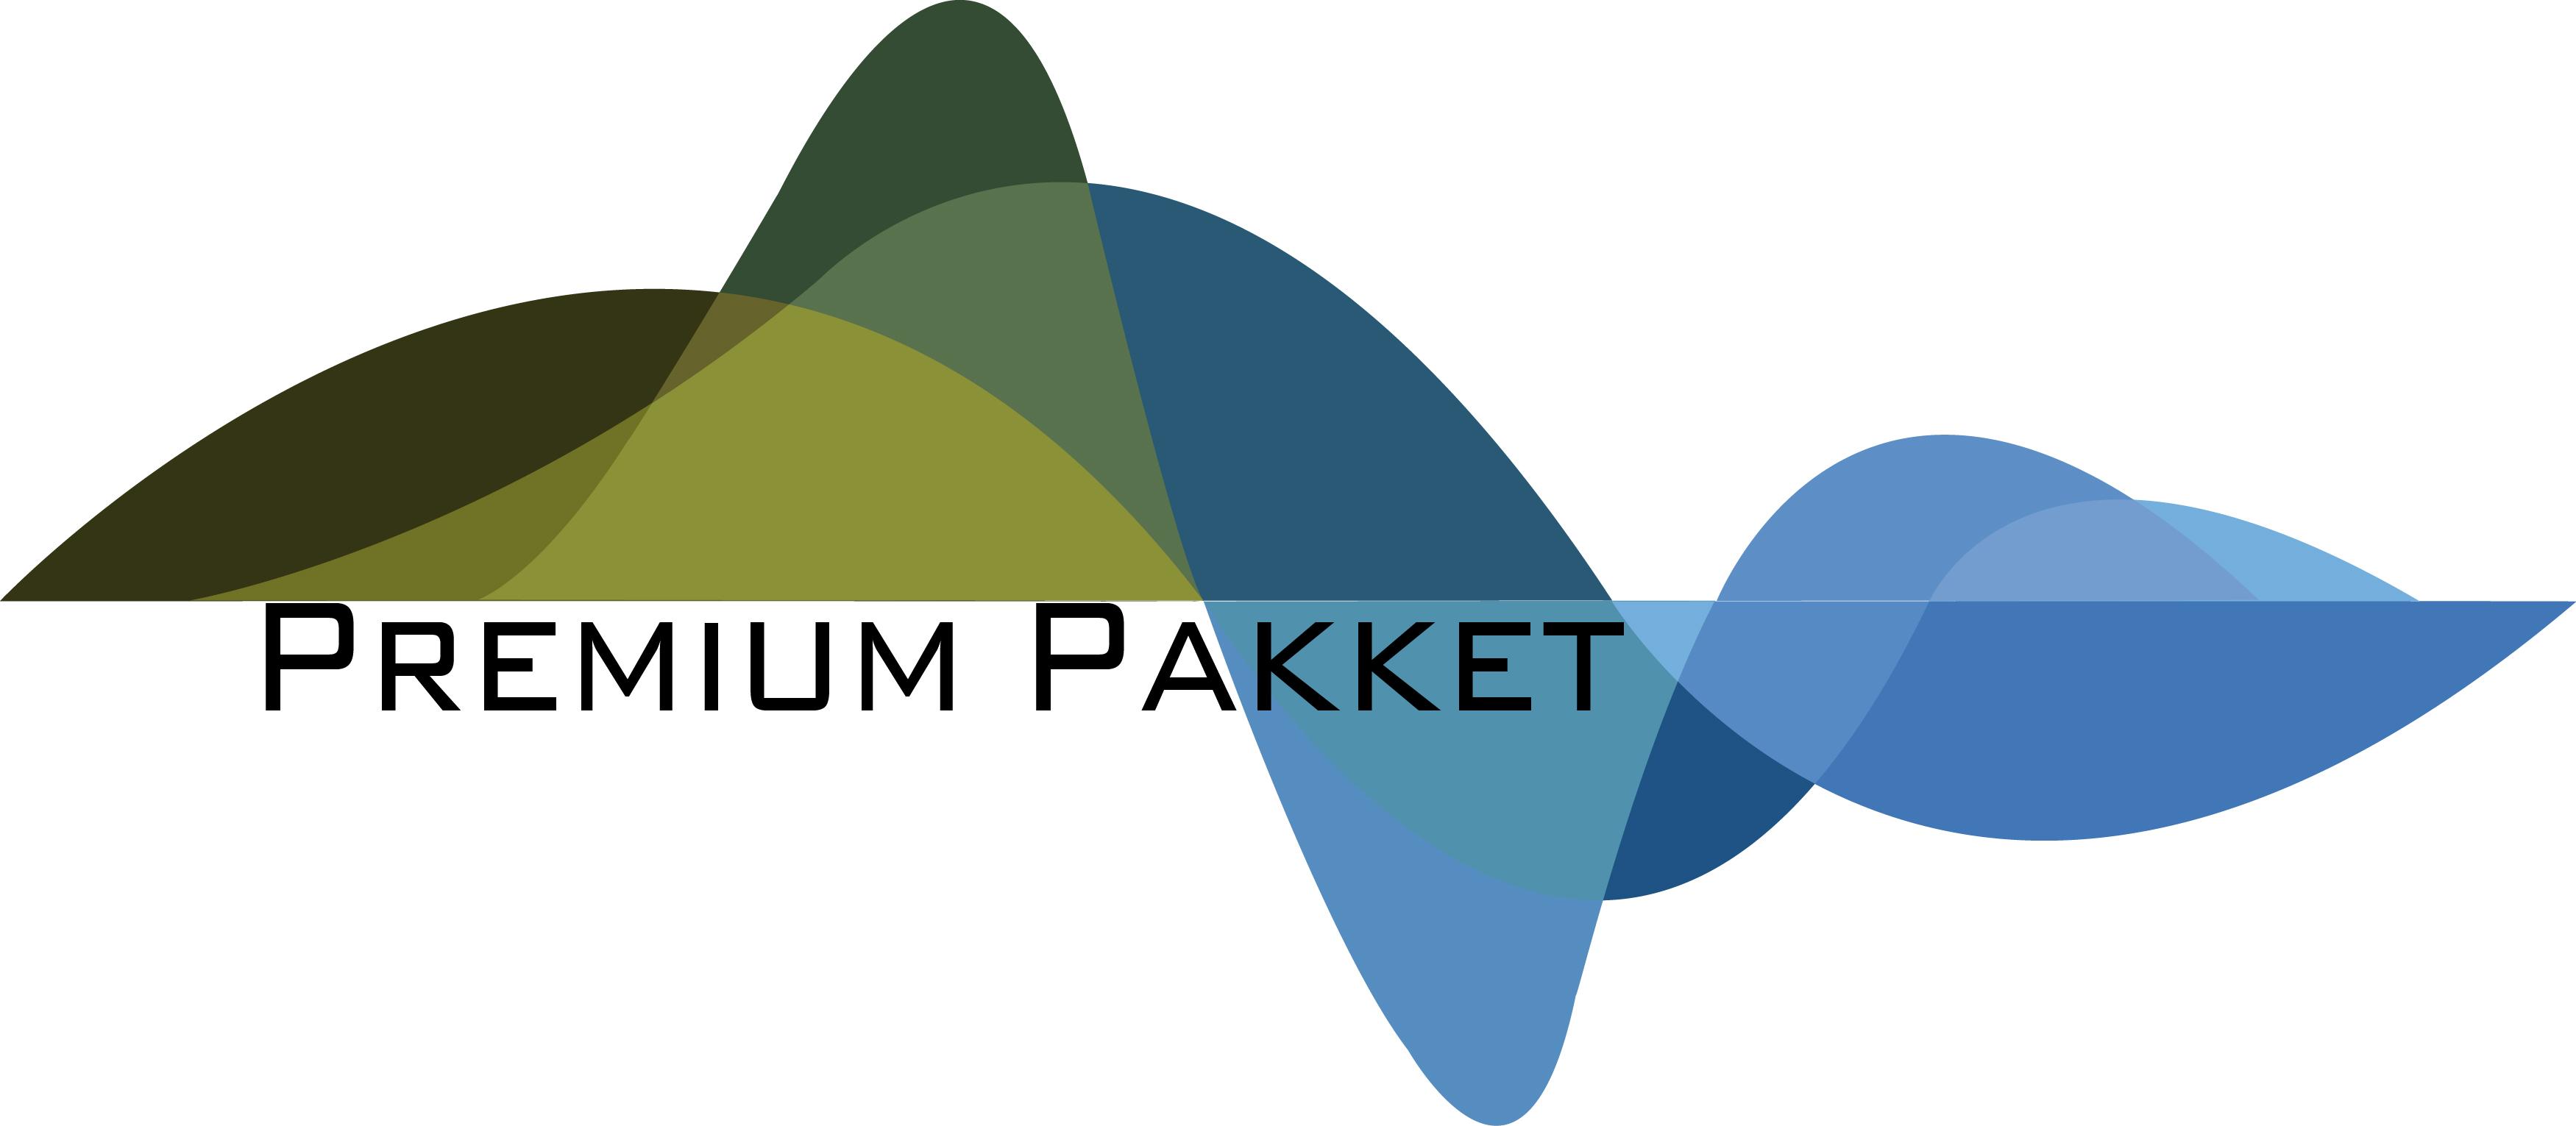 product image premium pakket